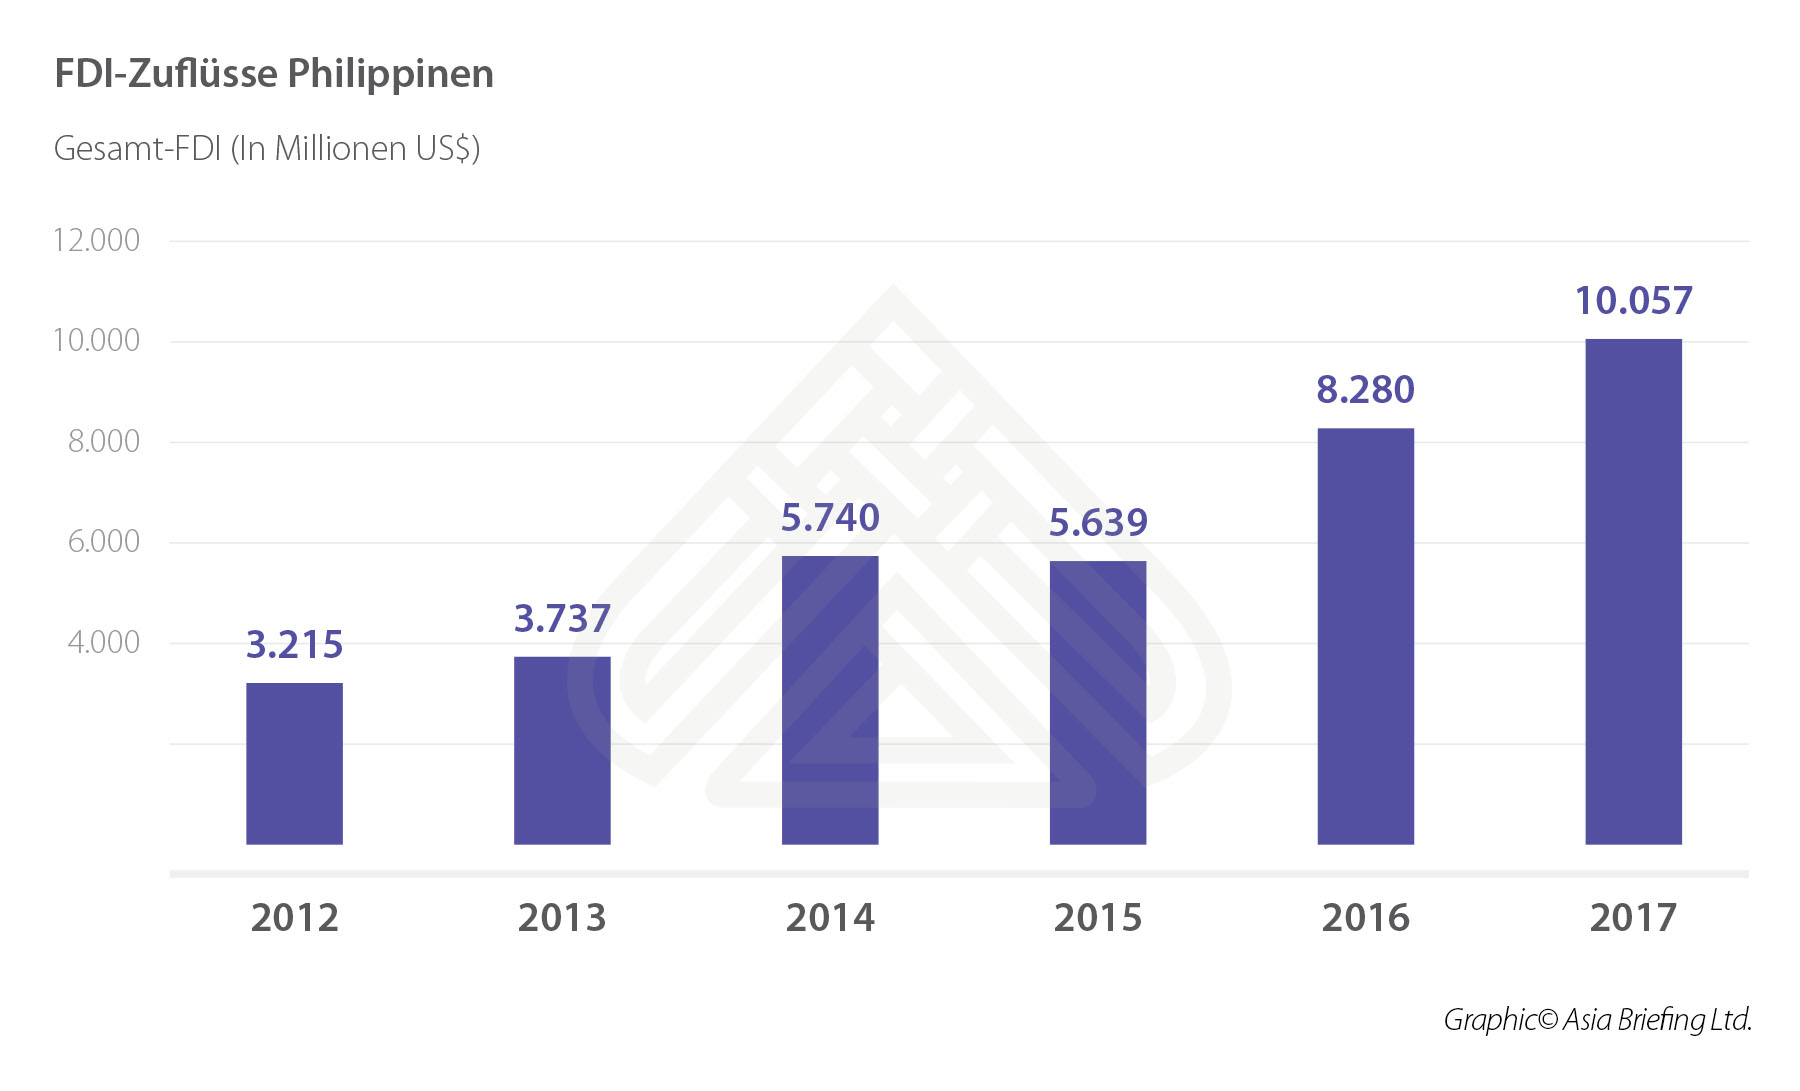 FDI Inflow in Philippines